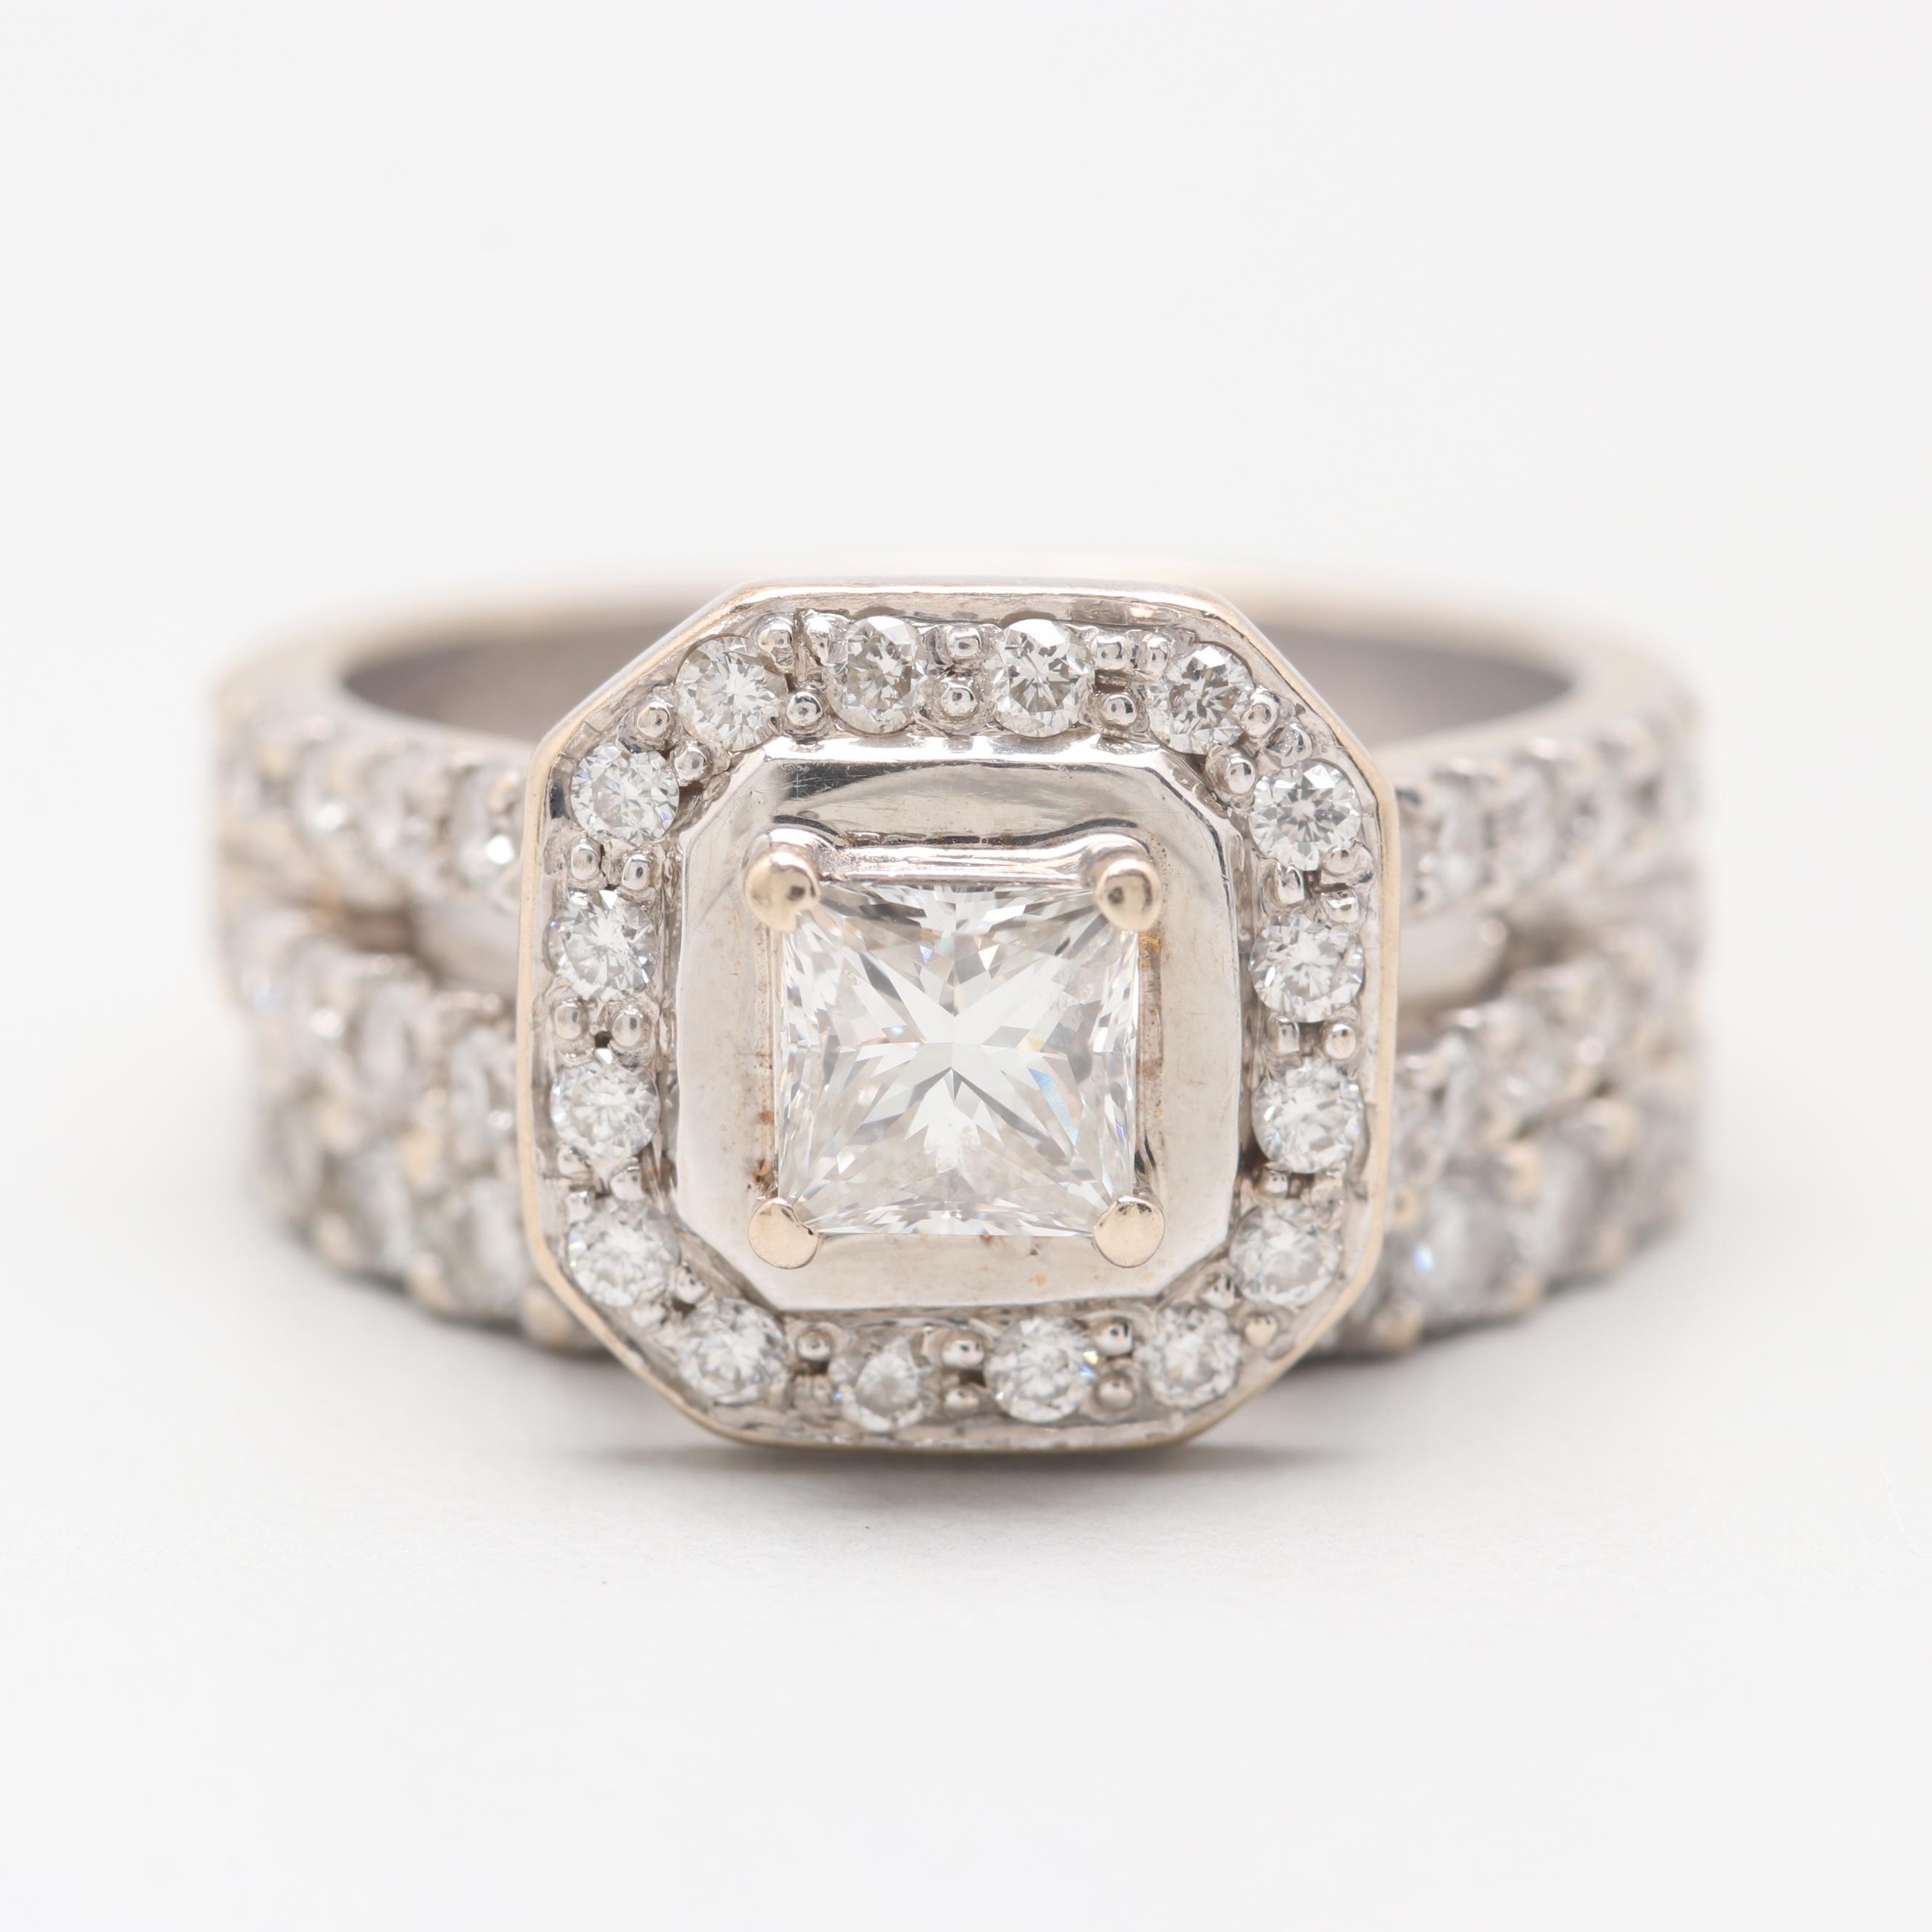 18K White Gold 1.46 CTW Diamond Ring Set